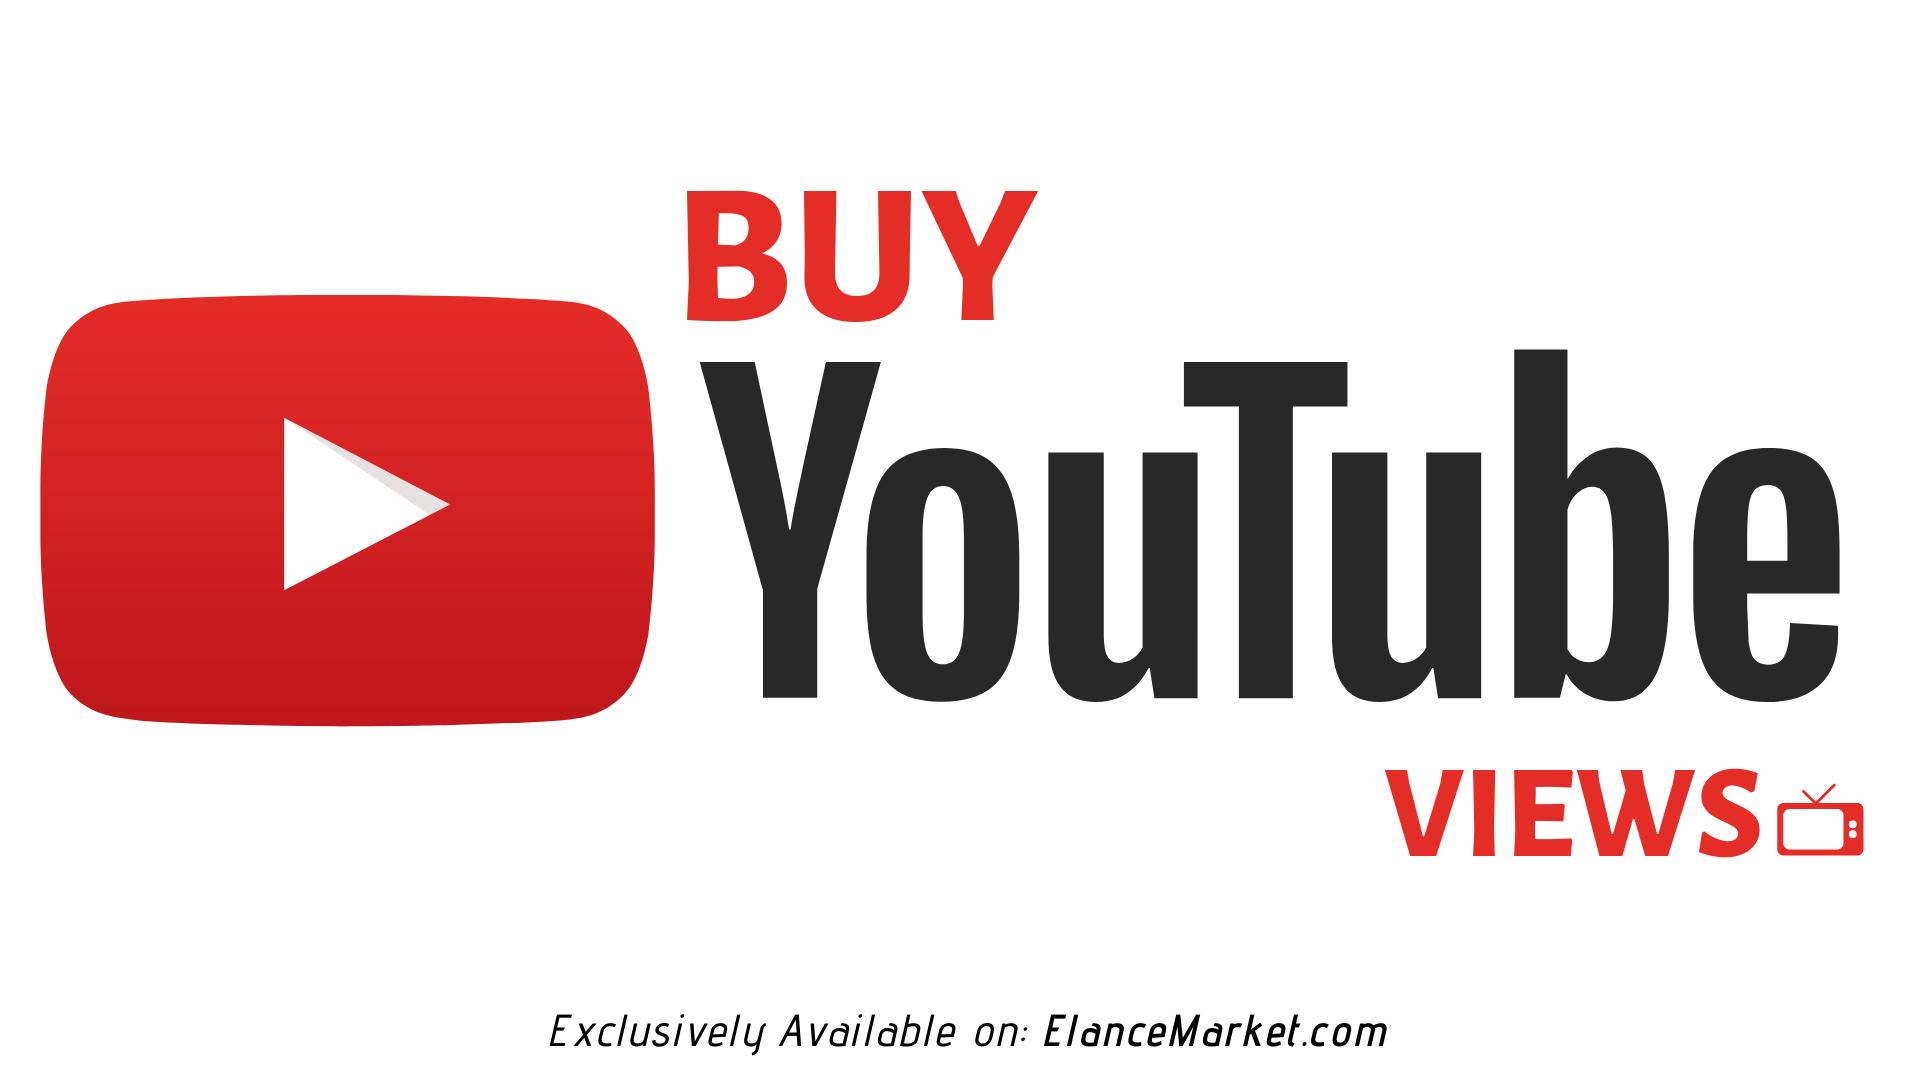 Buy YouTube Views | Refill Guarantee